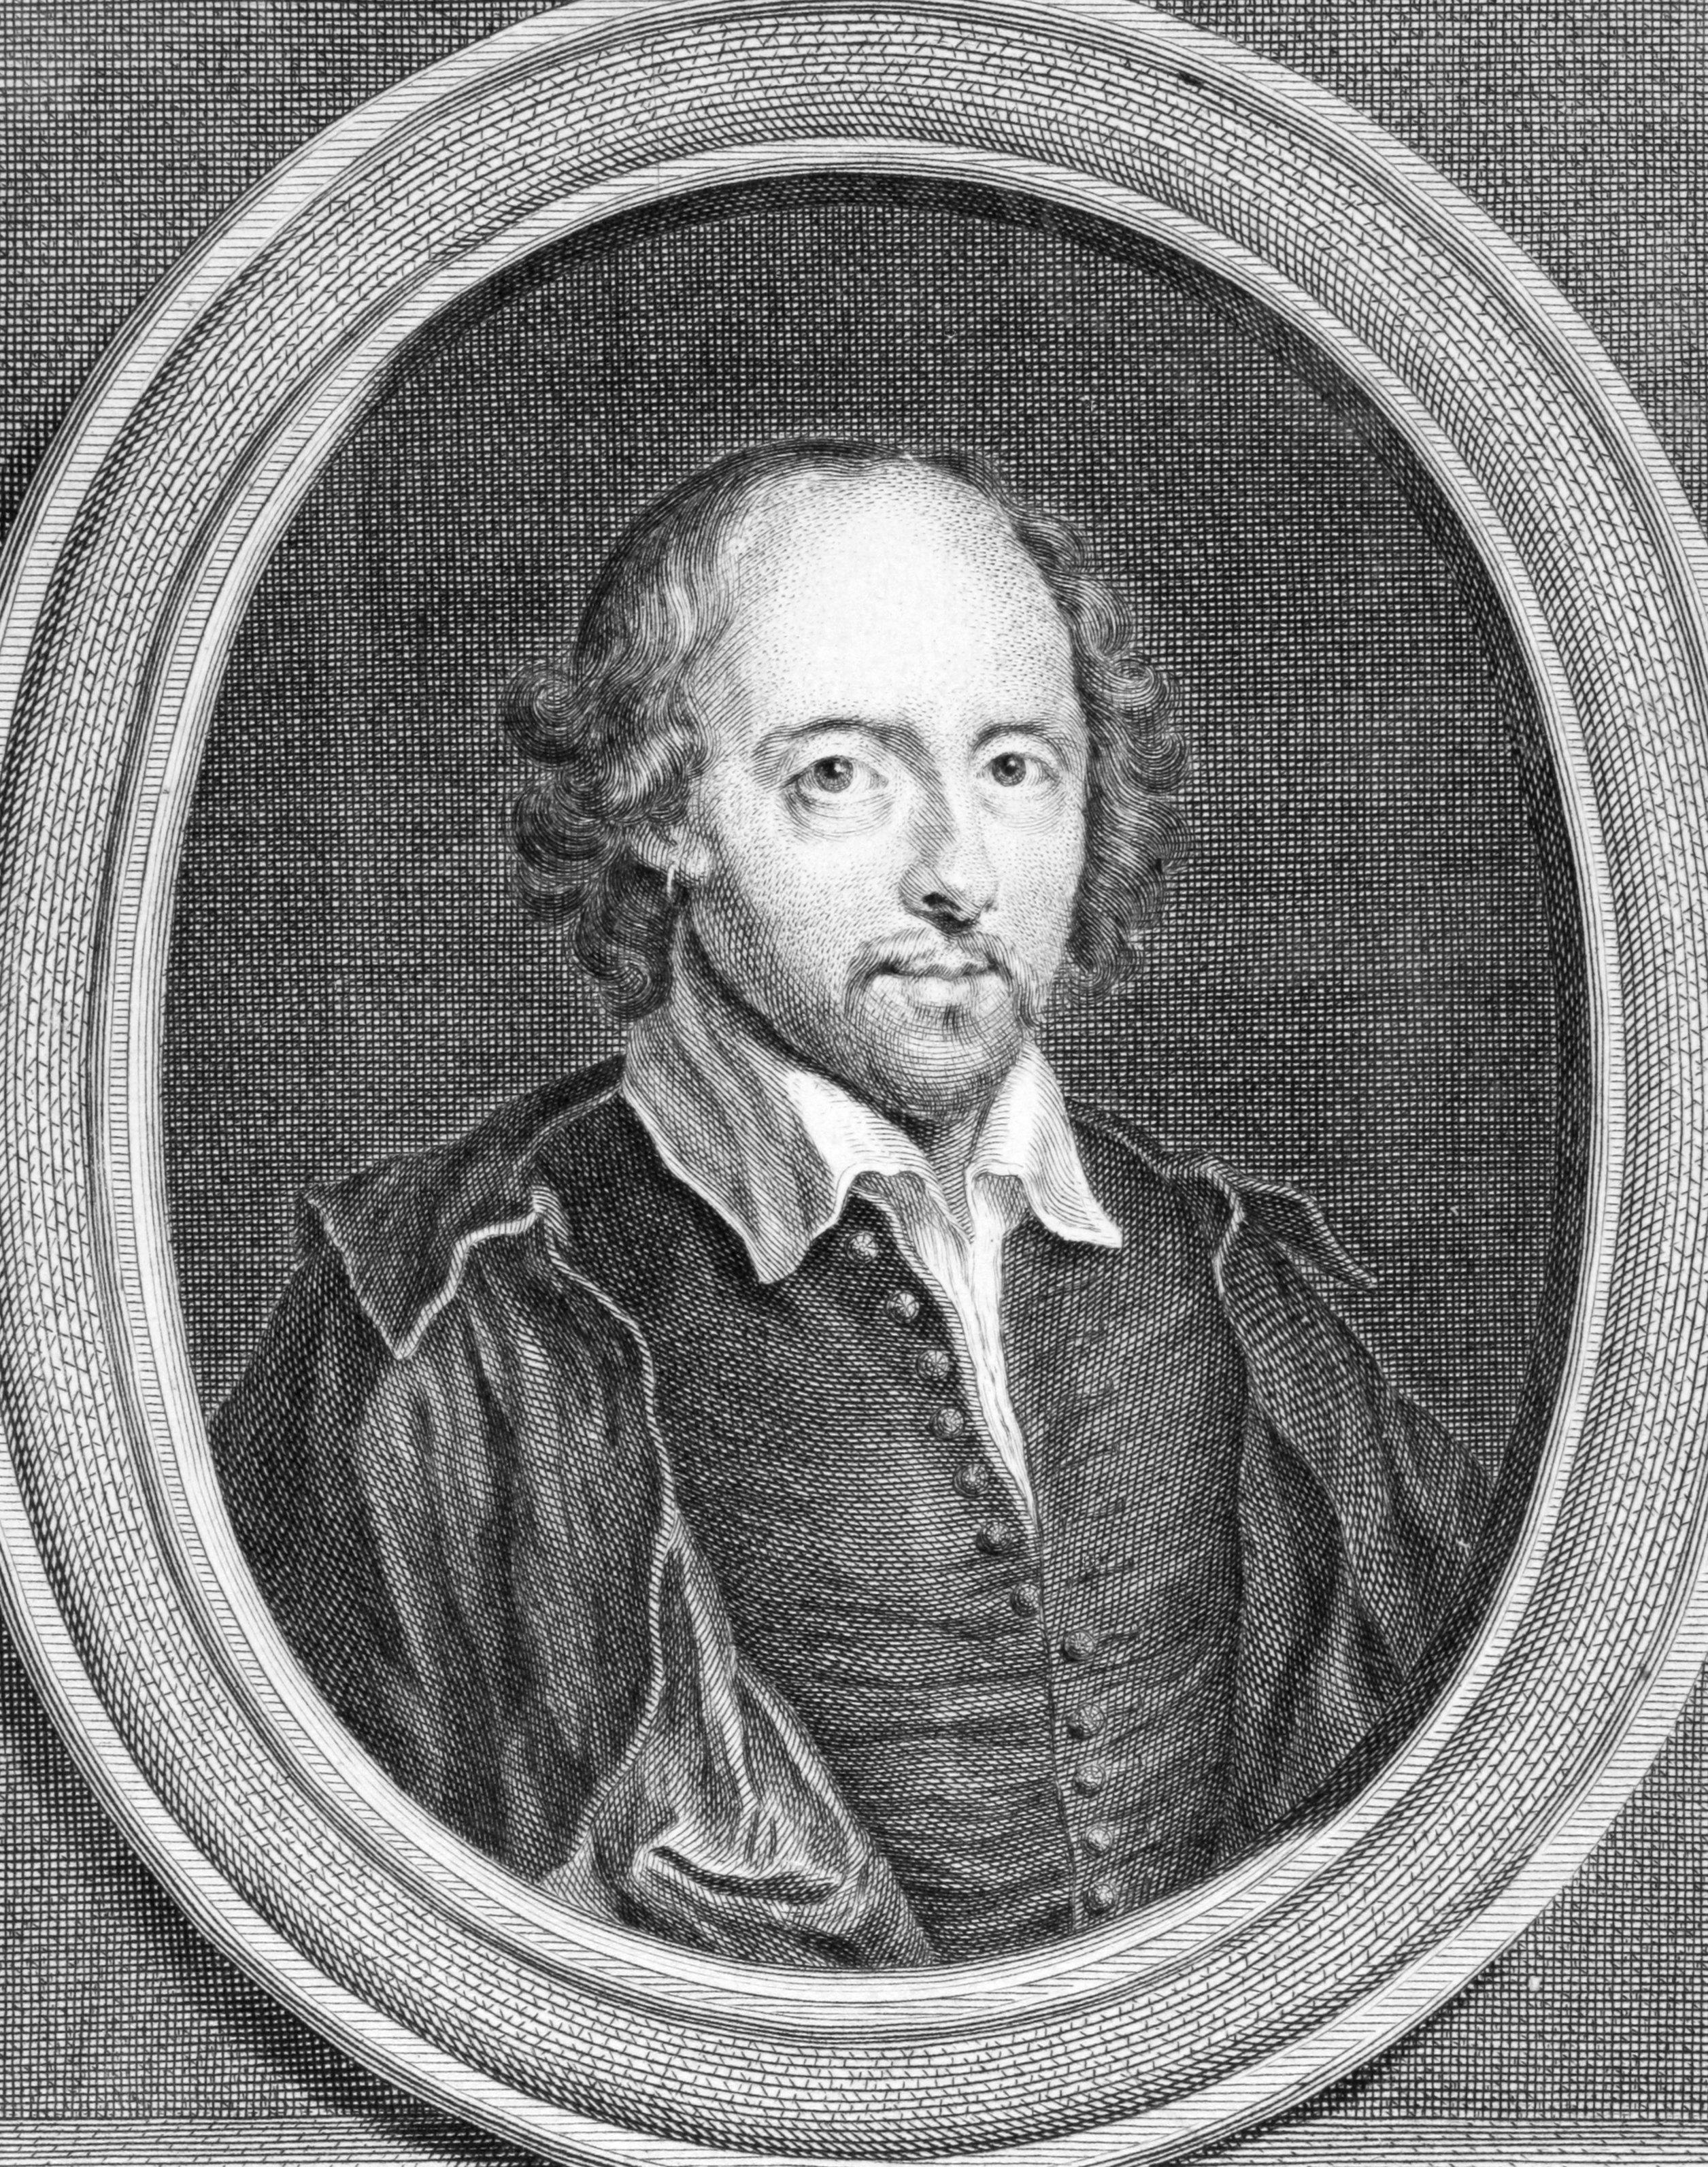 Talk Like Shakespeare Day 2019